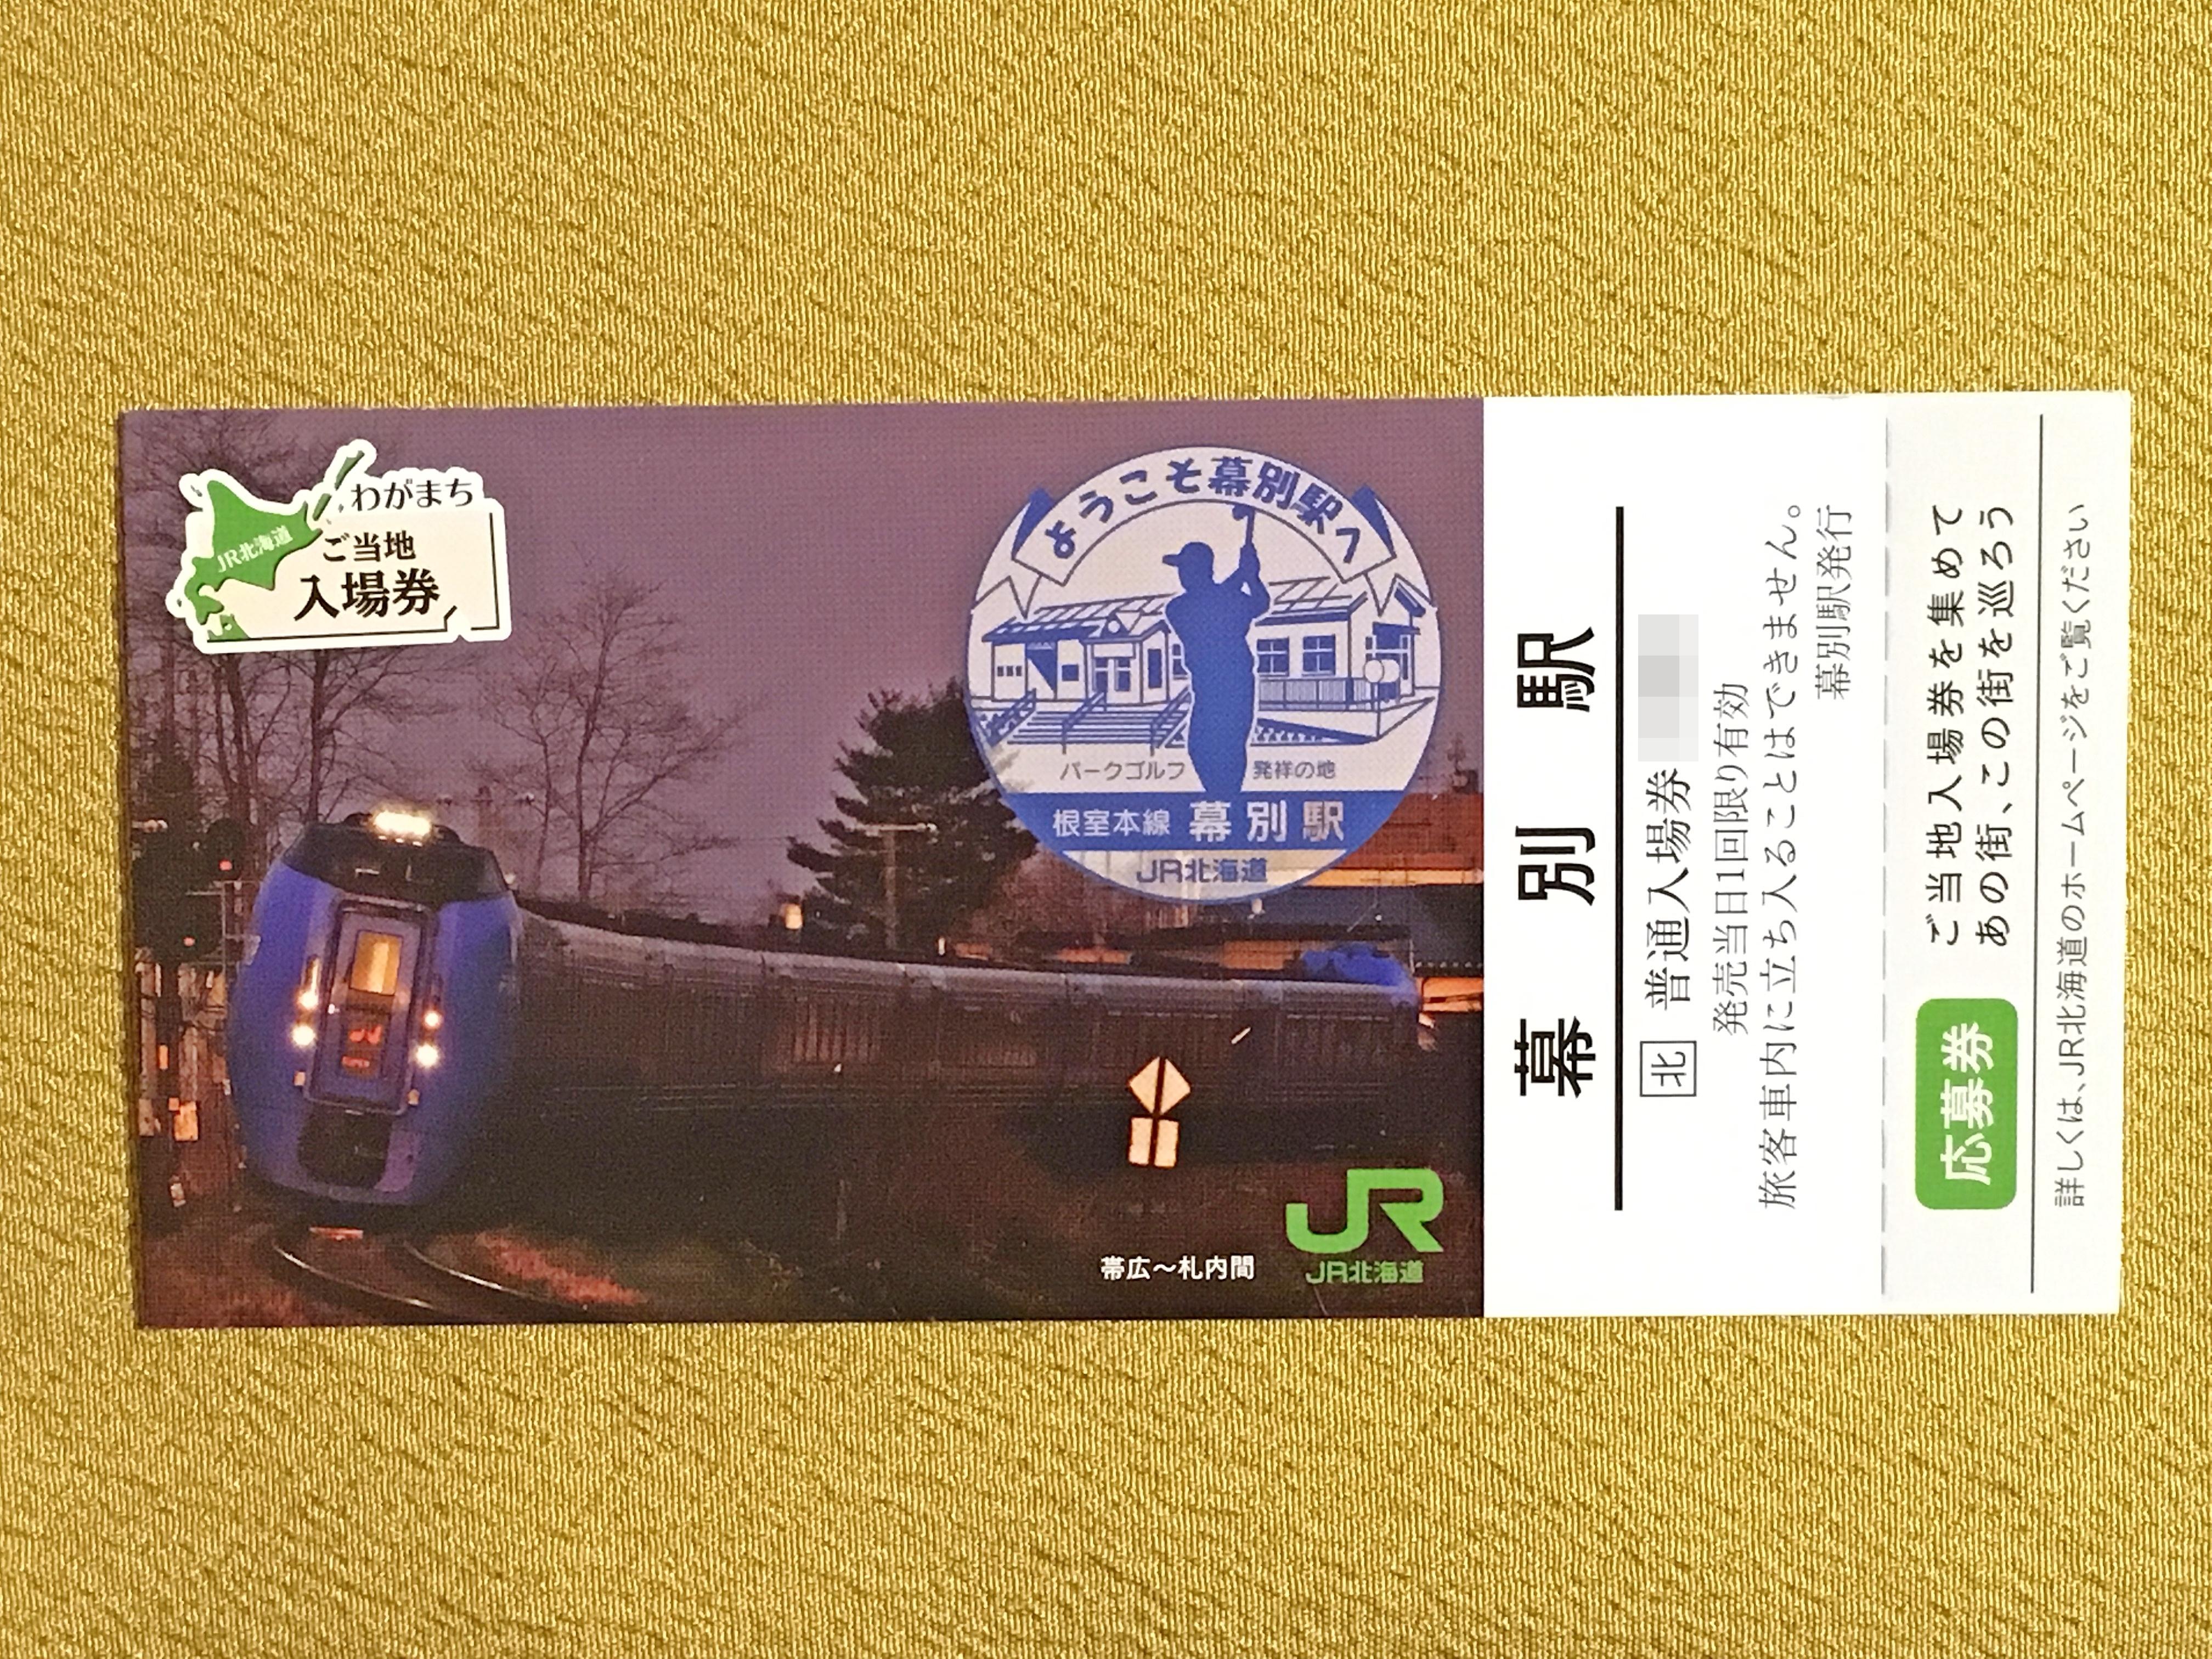 JR北海道ご当地入場券 幕別駅表.JPG